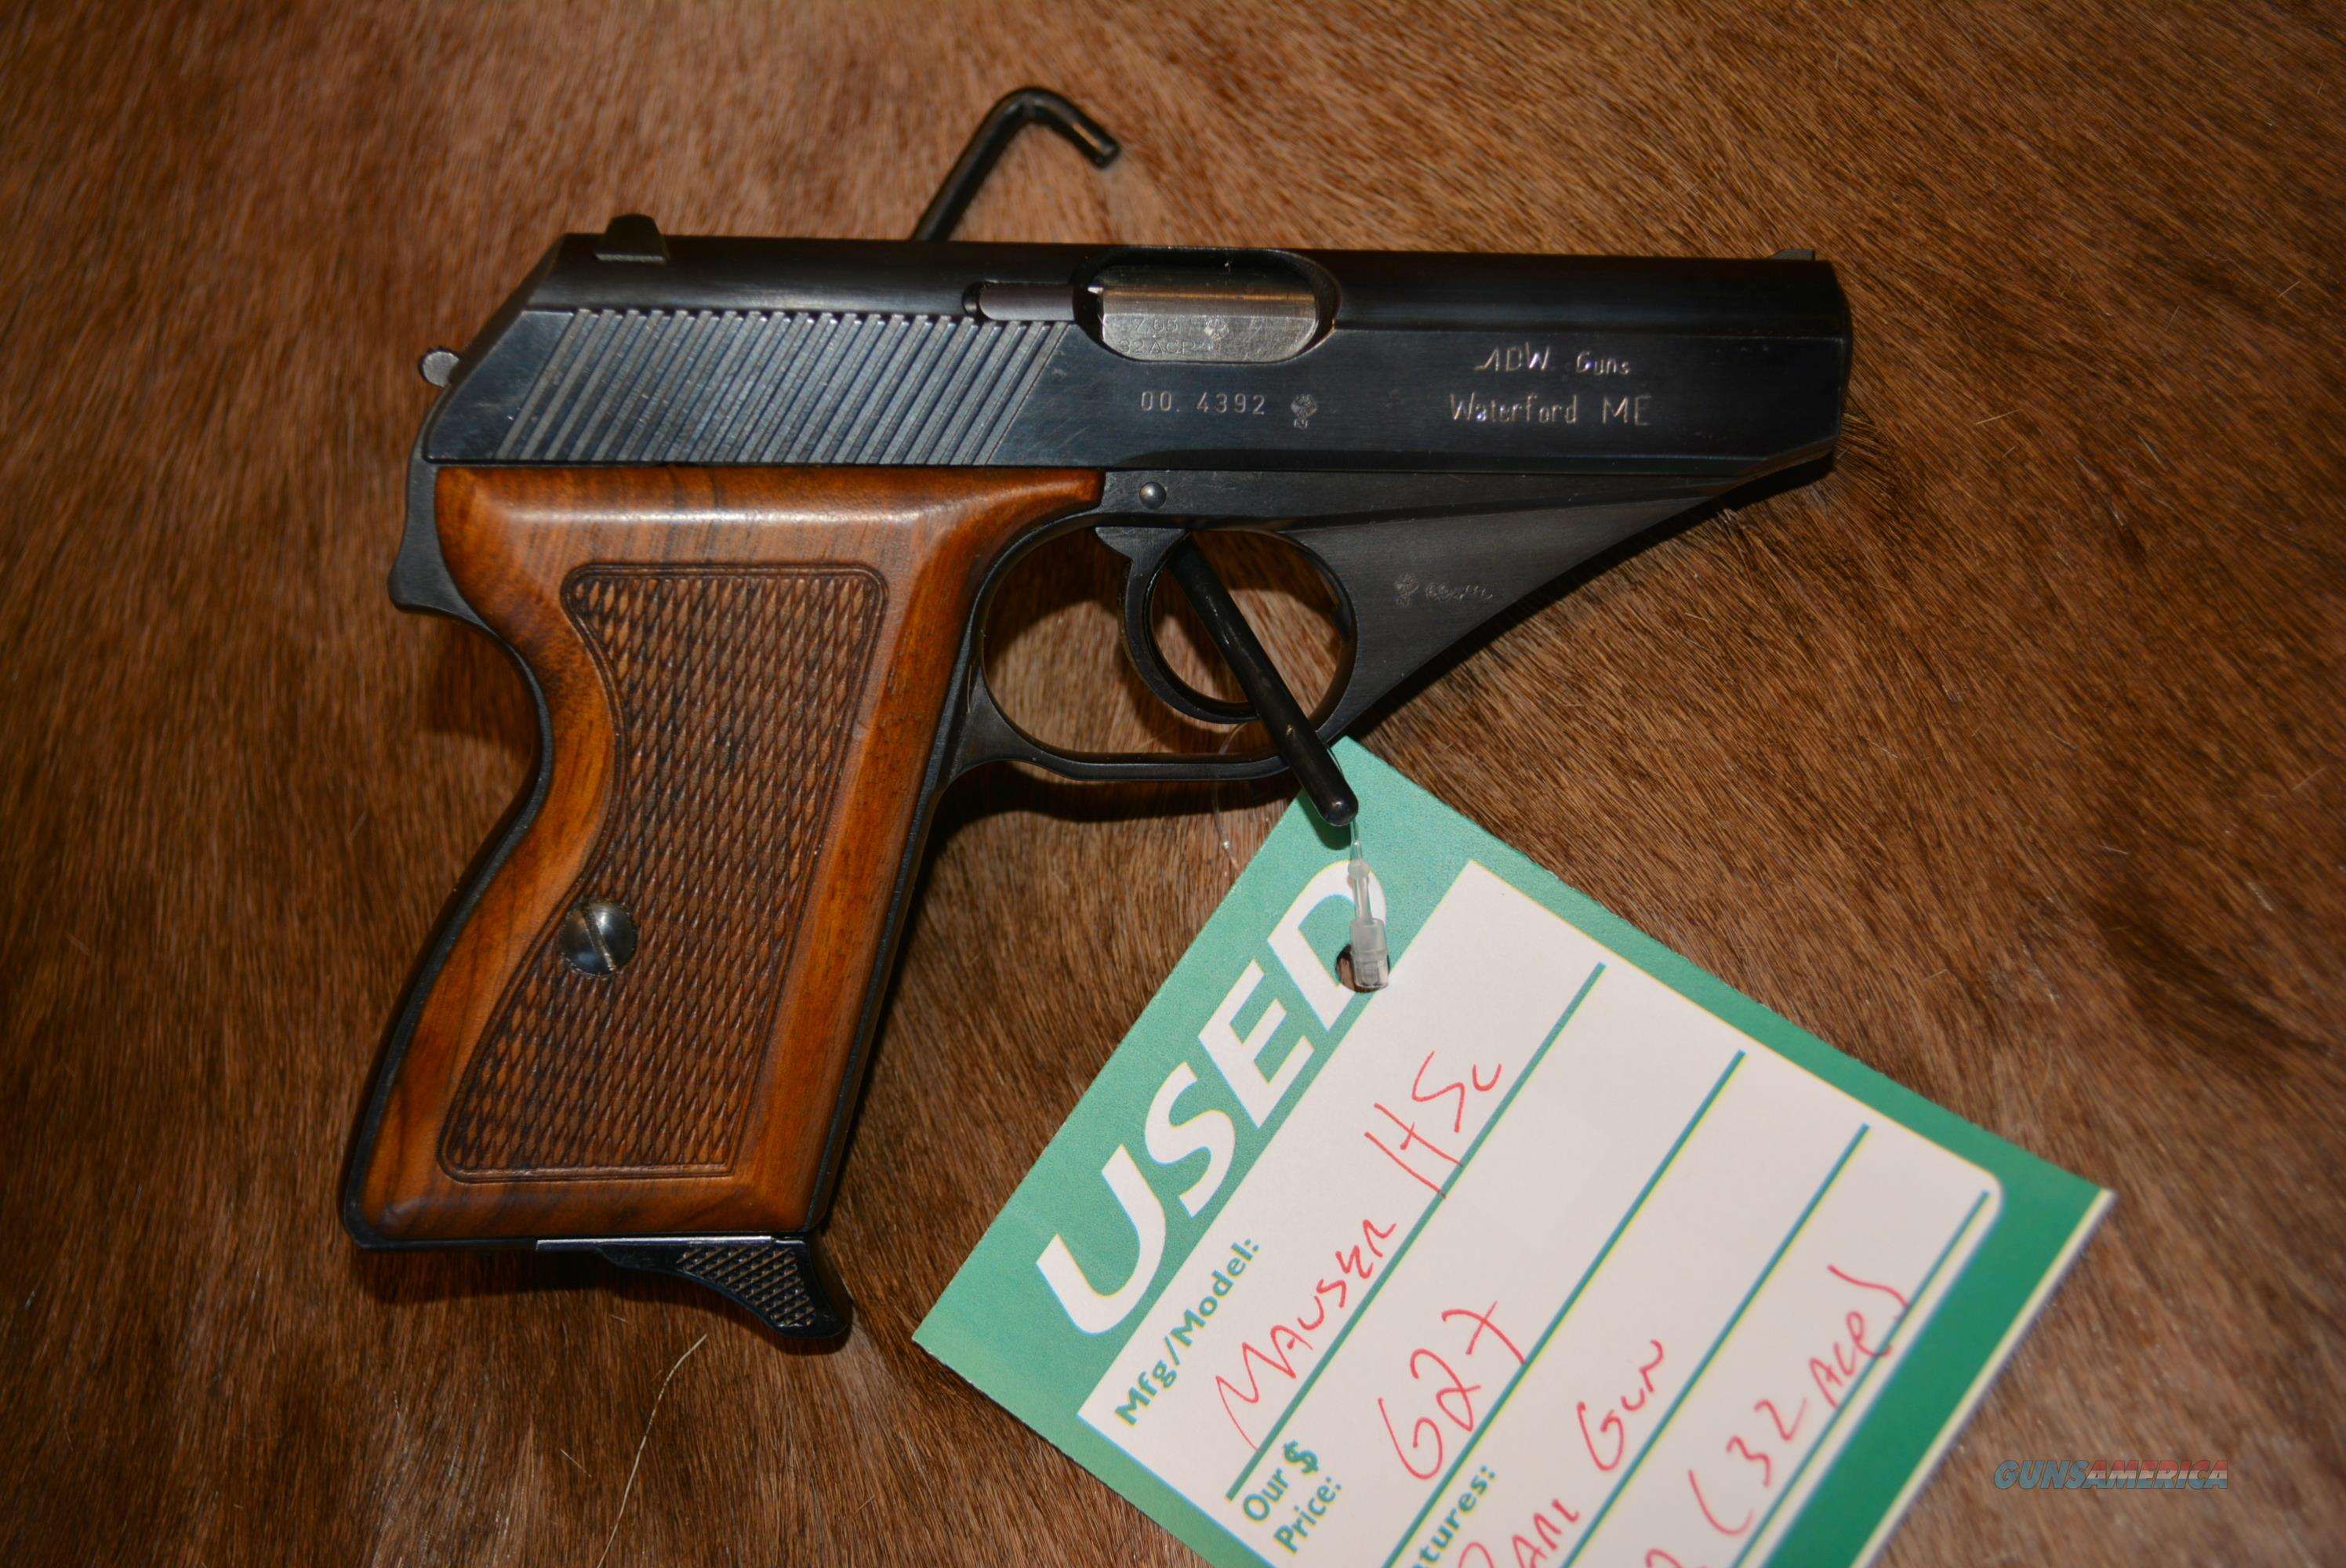 Mauser HSc 7.65 (32ACP) W/German Proof Marks  Guns > Pistols > Mauser Pistols